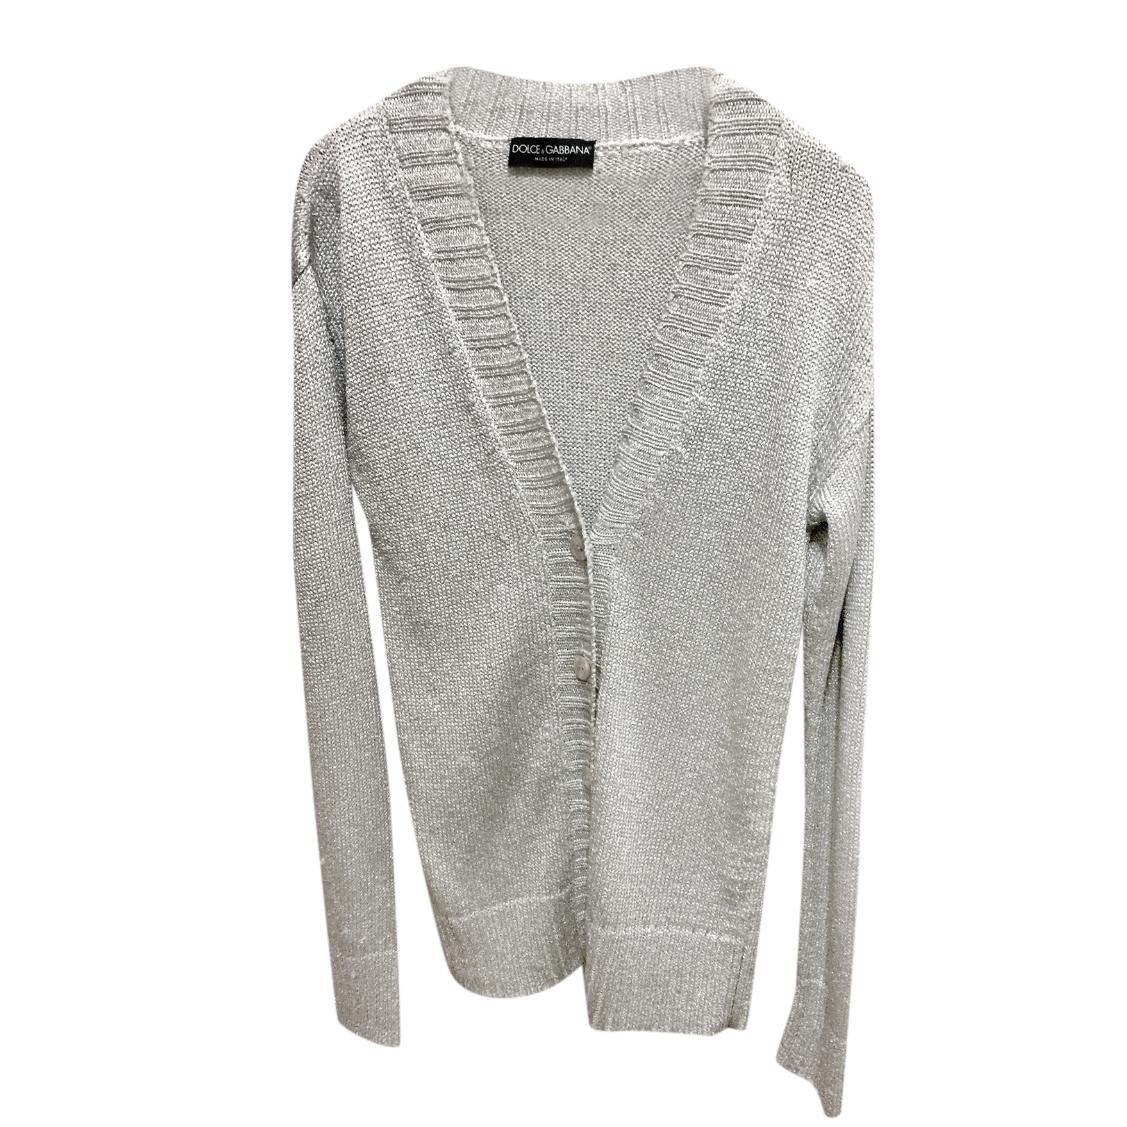 Dolce & Gabbana Silver Metallic Knit Cardigan